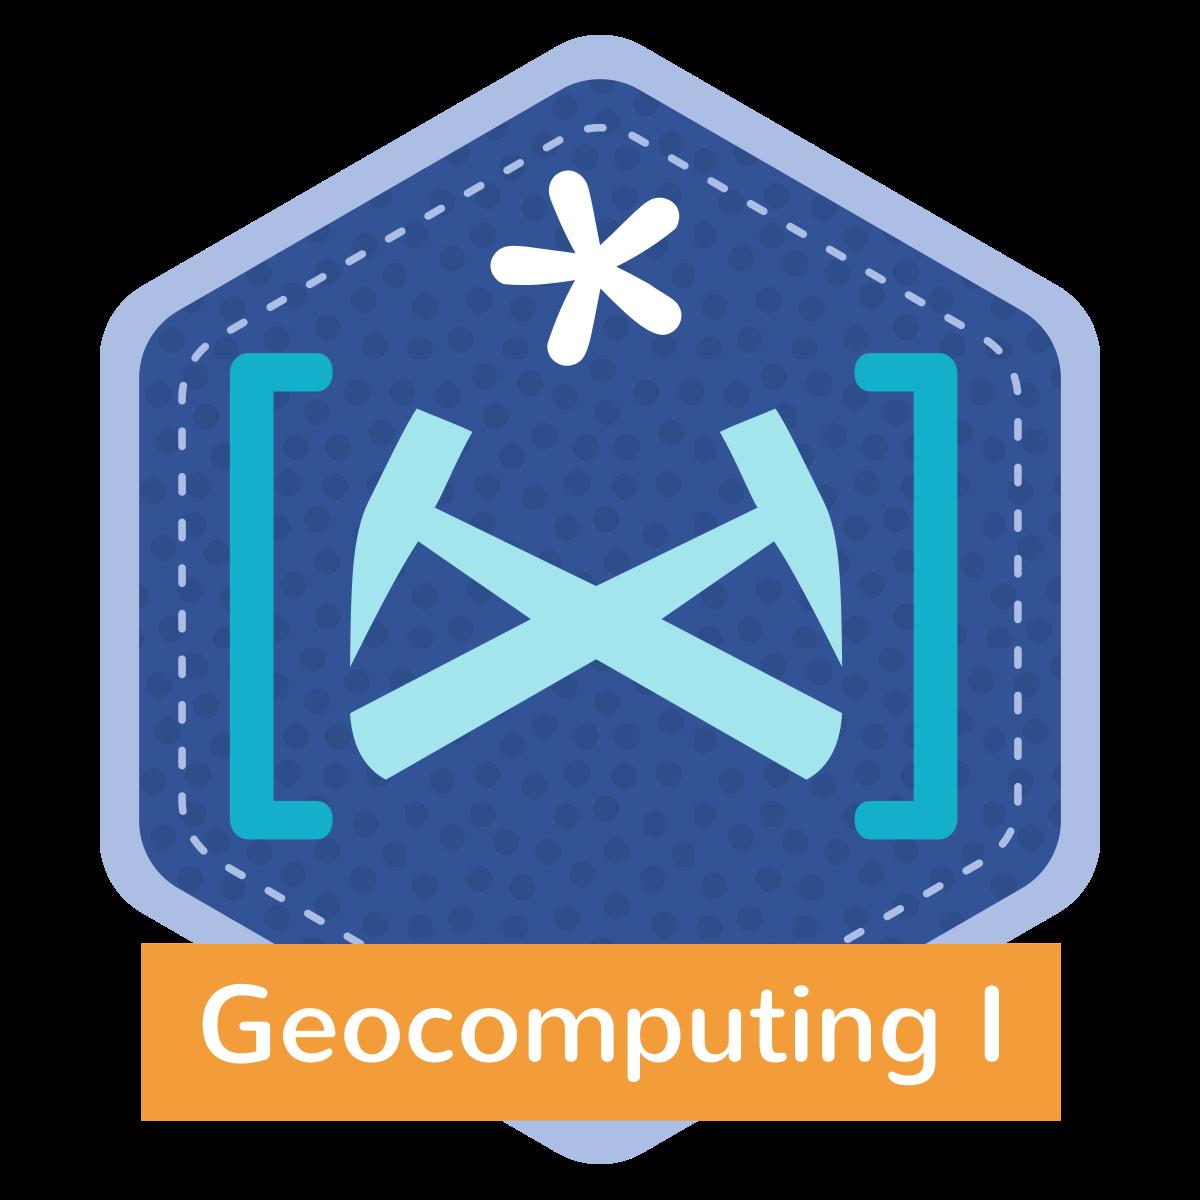 Geocomputing_1.png